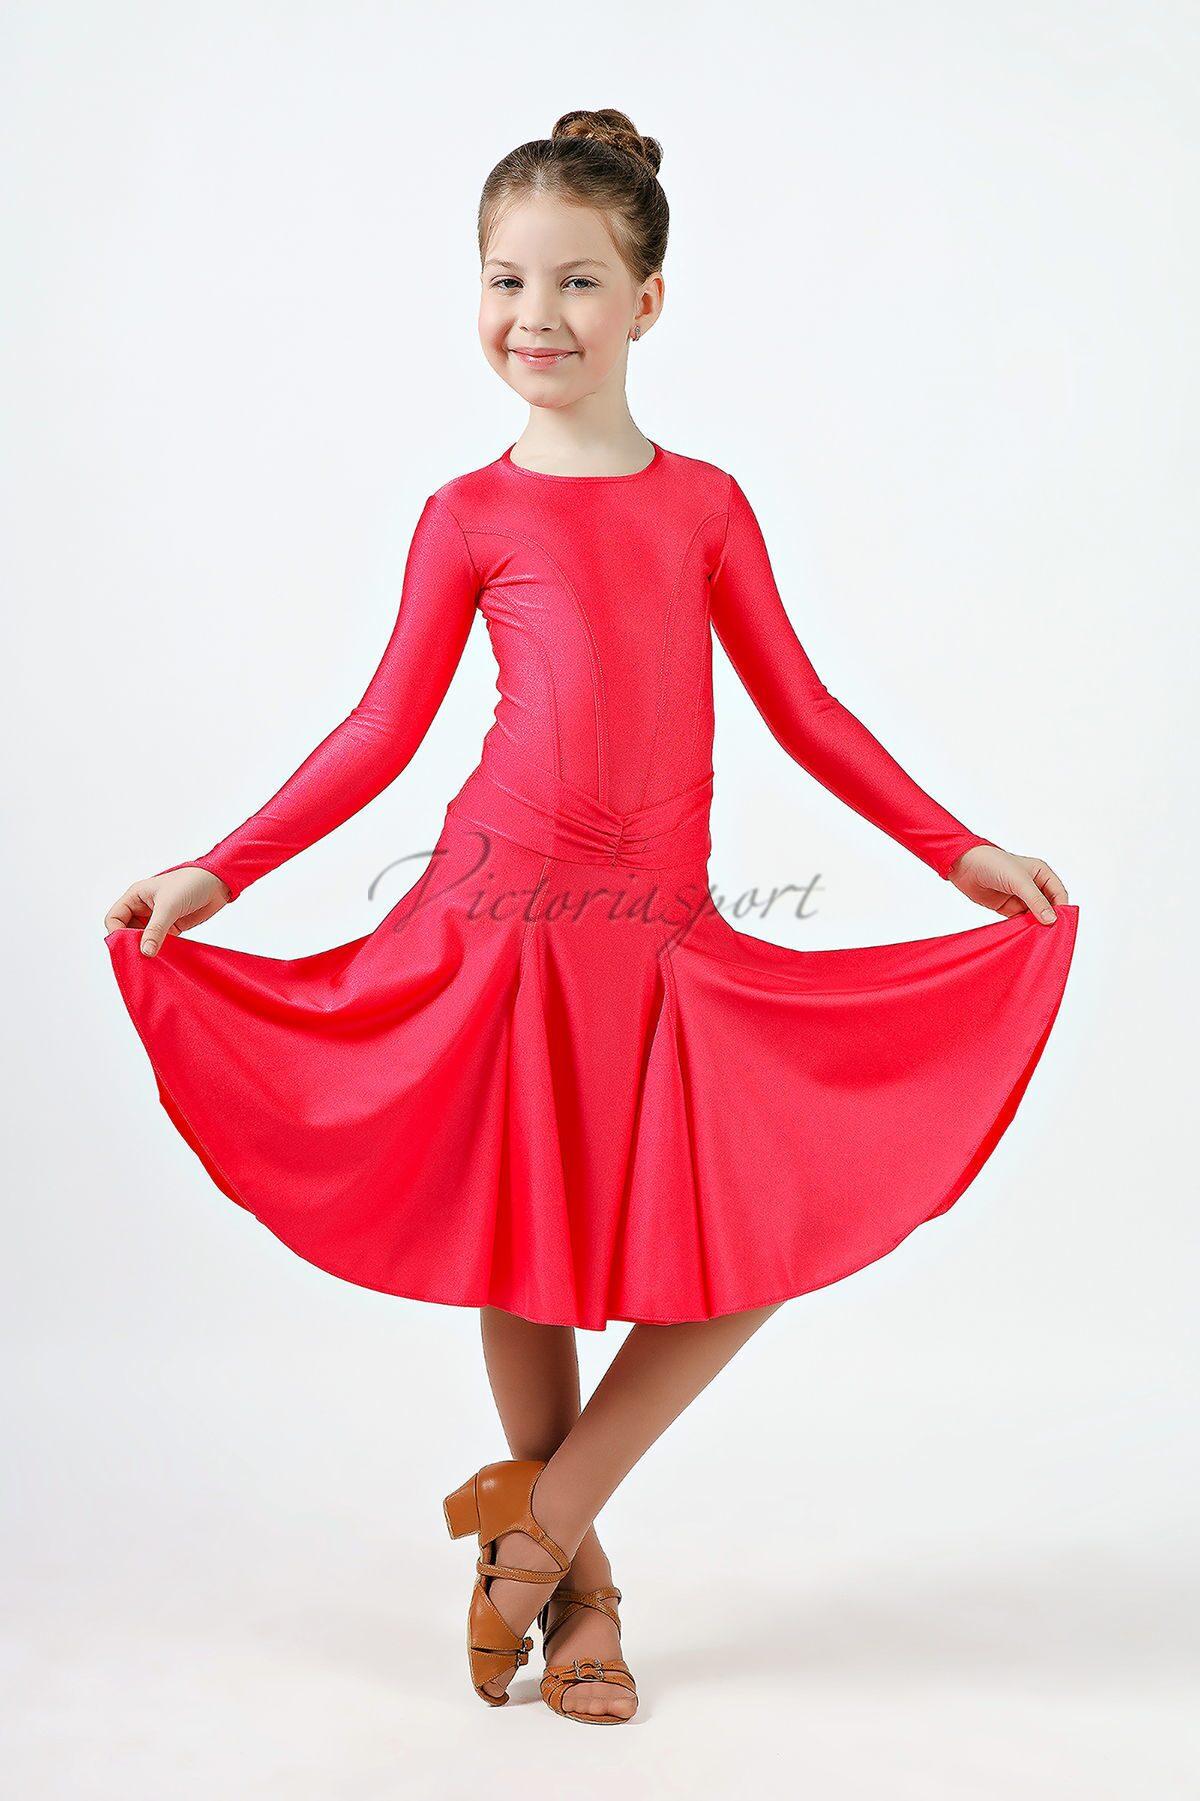 b767207a0c19 Одежда для танцев   Интернет-магазин VS